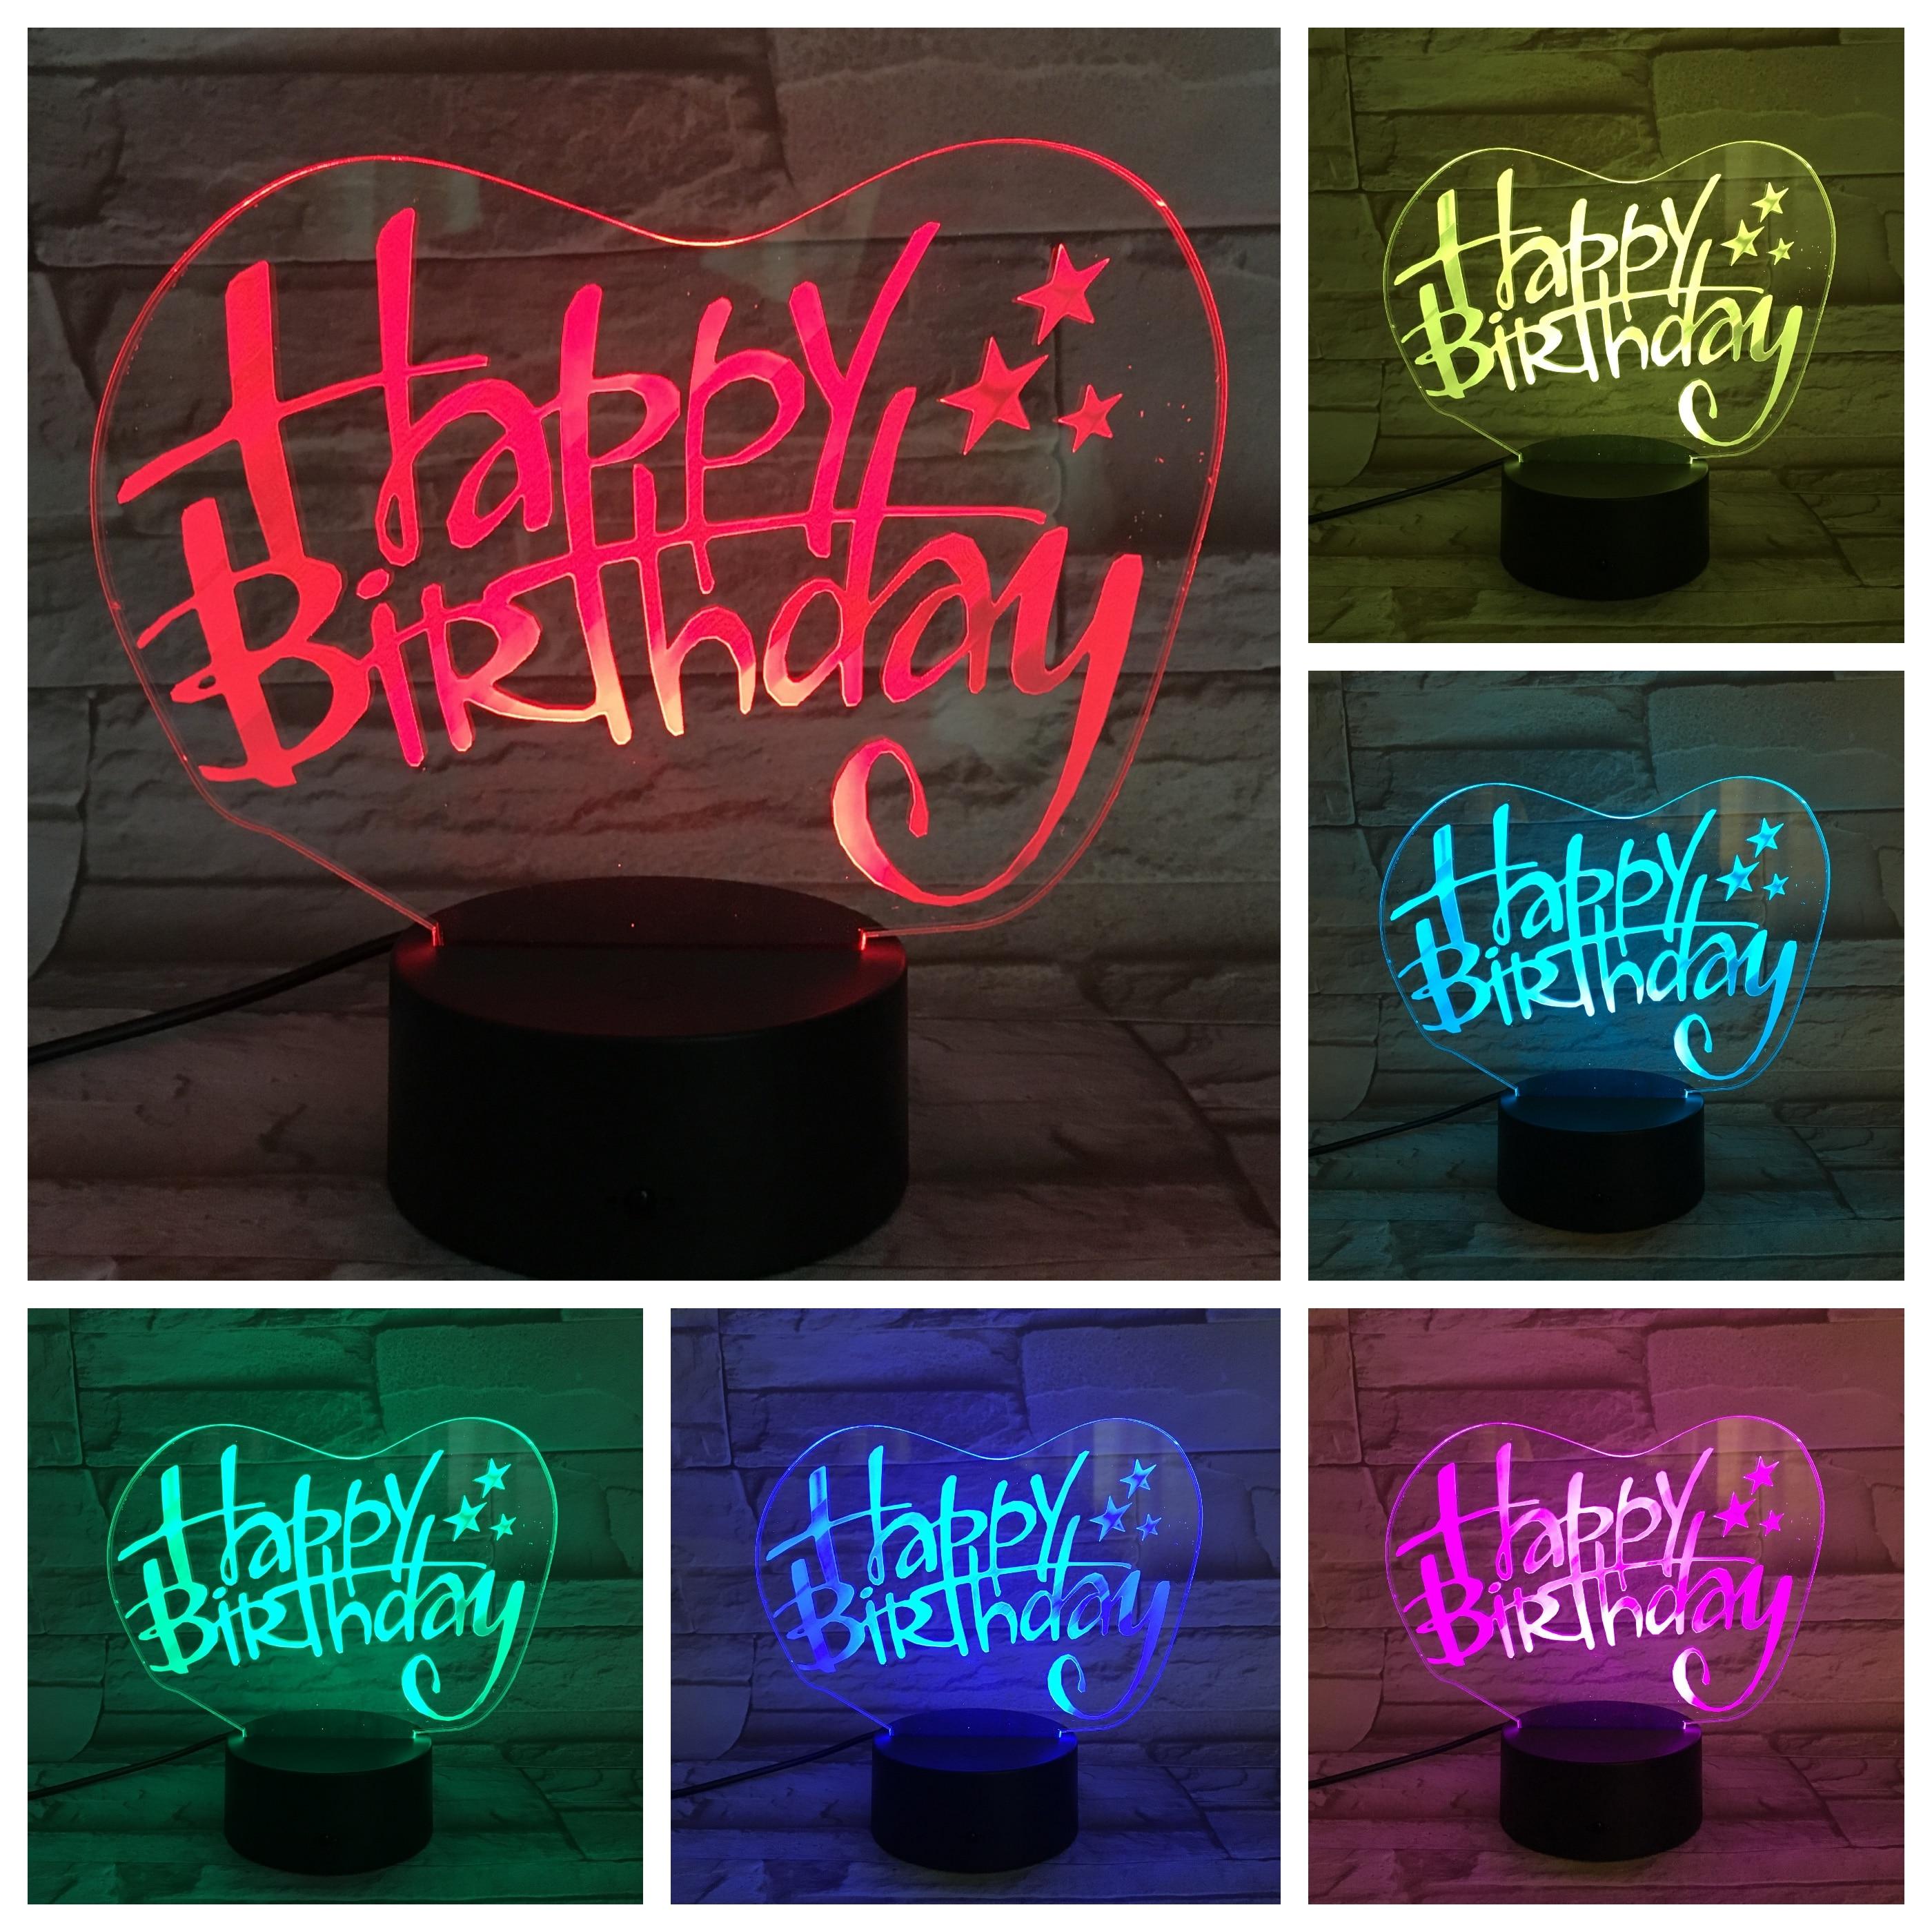 Birthday Gifts 3D LED Lamp bedside decorative lights gece lambasi RGB Boy Child Kids Baby Gift USB 3D LED Night Light Neon